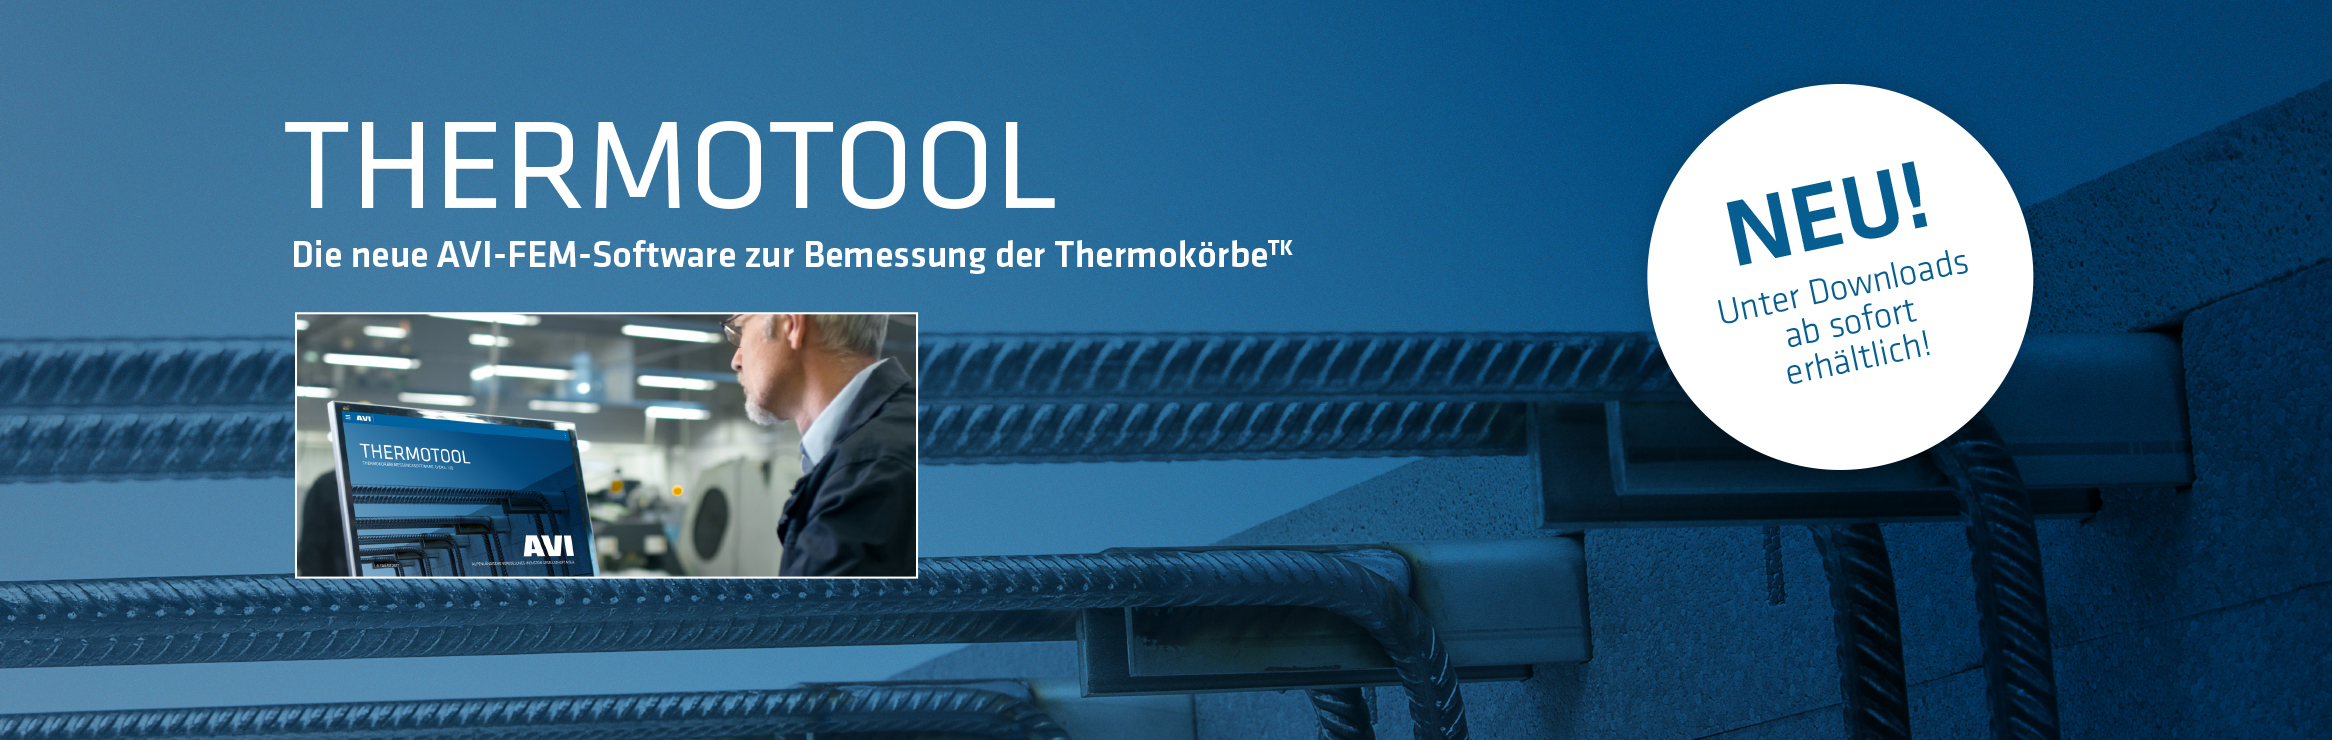 Thermotool_Homepage_Startseite_Banner